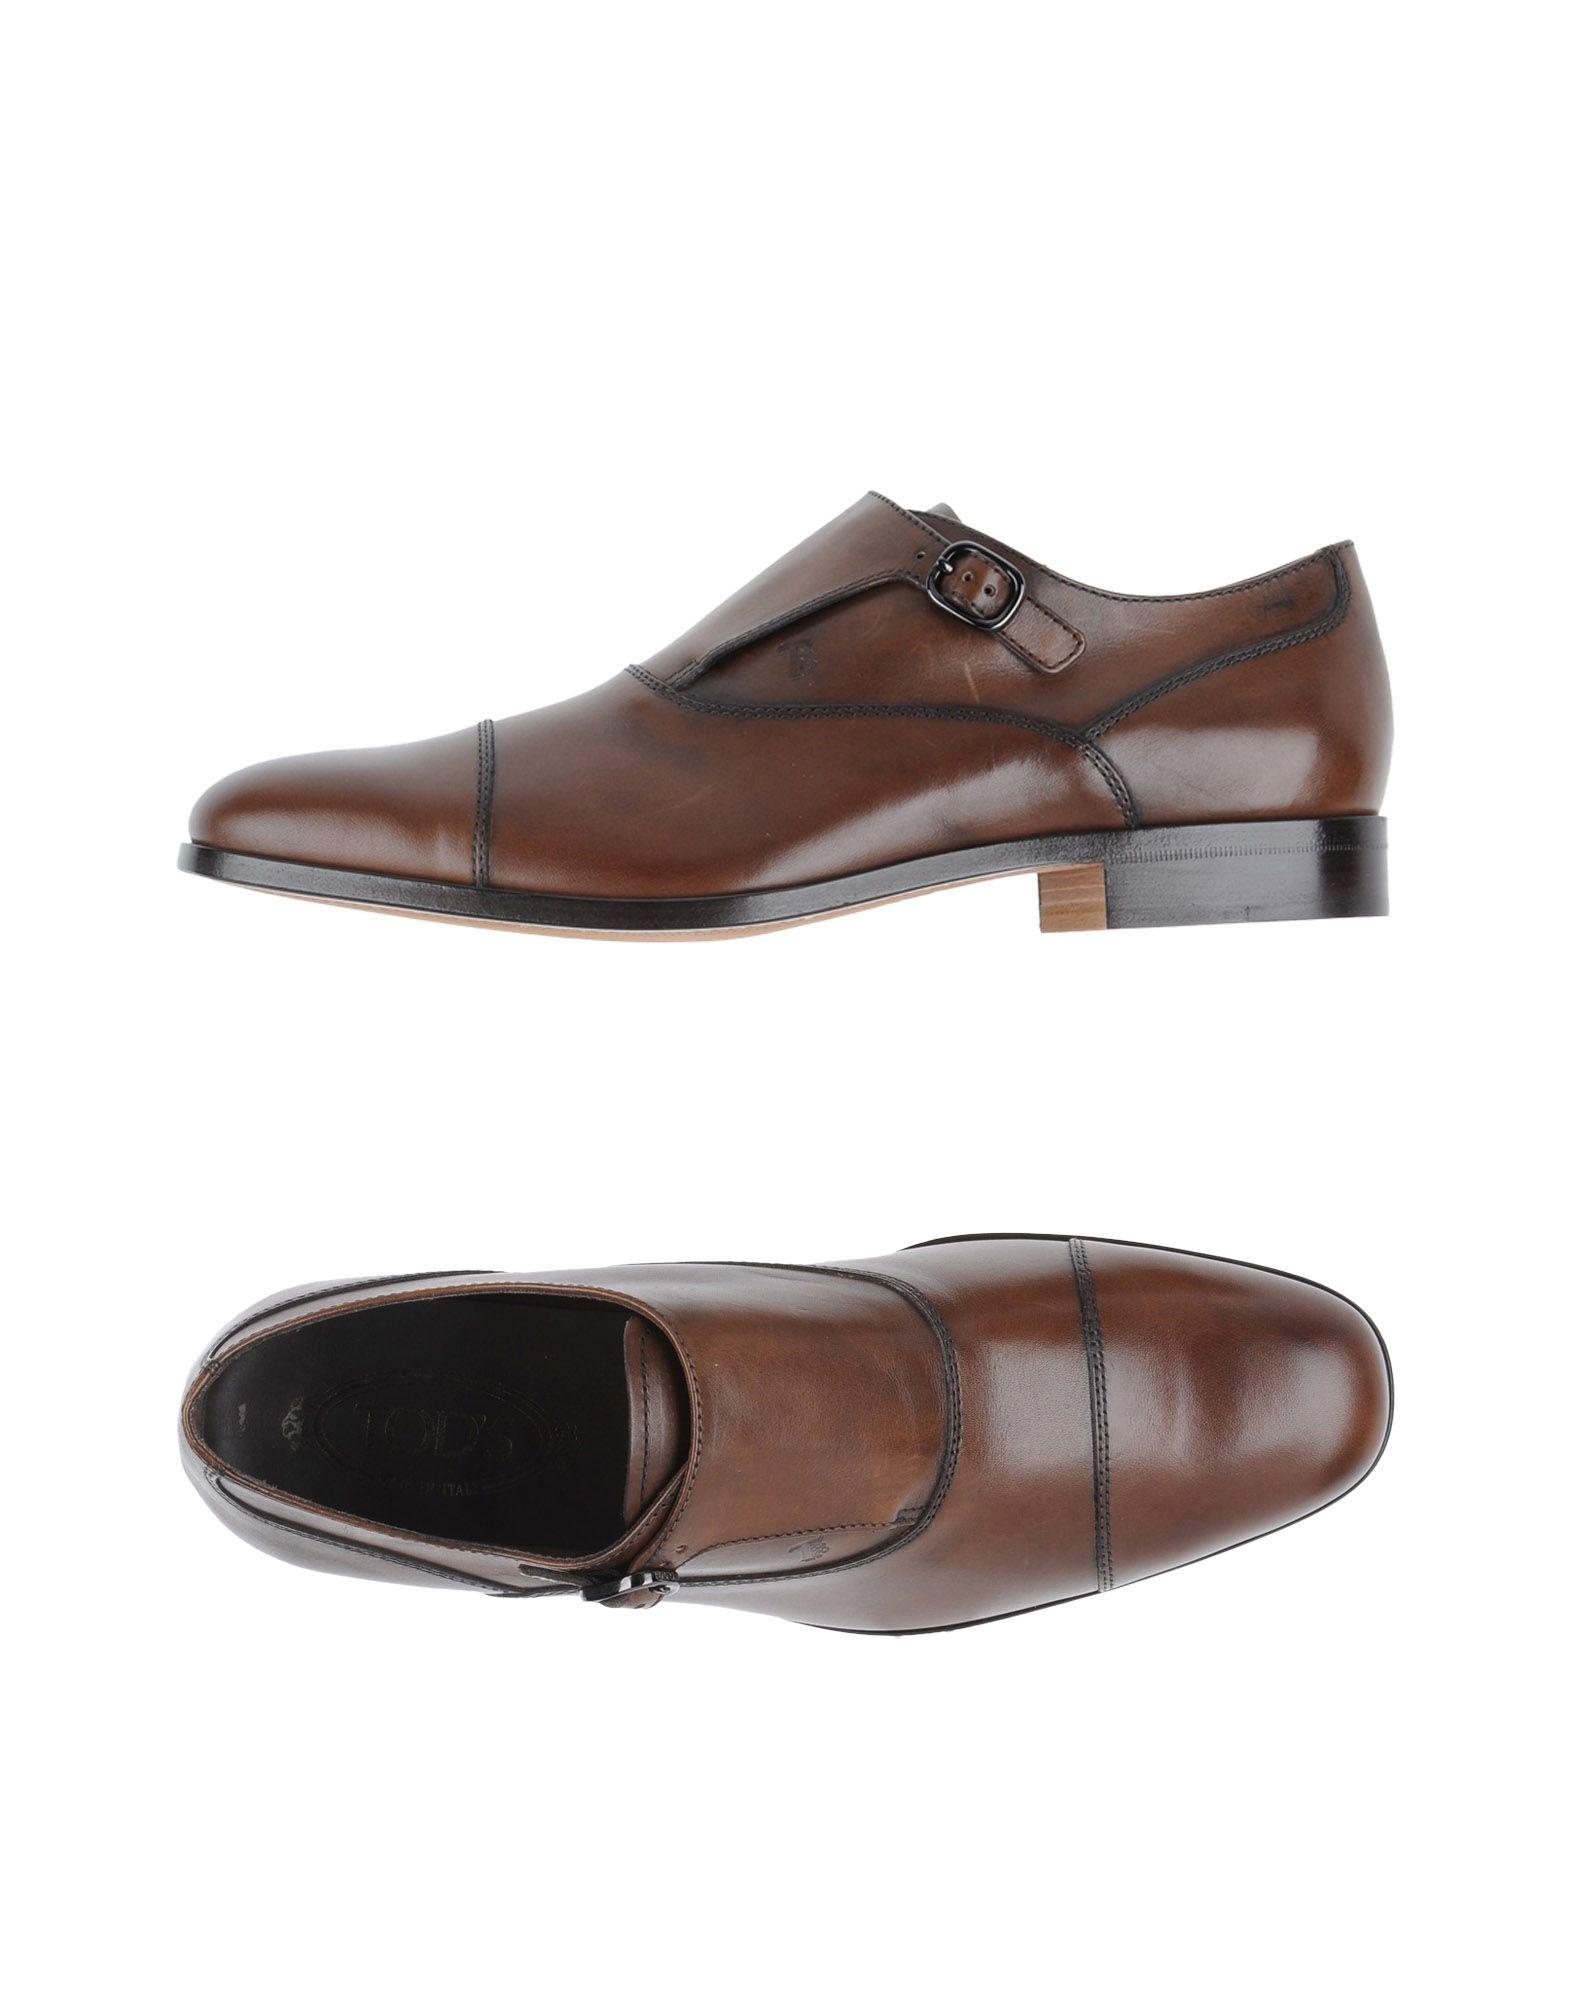 Tod's Mokassins Herren  11243370CB Gute Qualität beliebte Schuhe